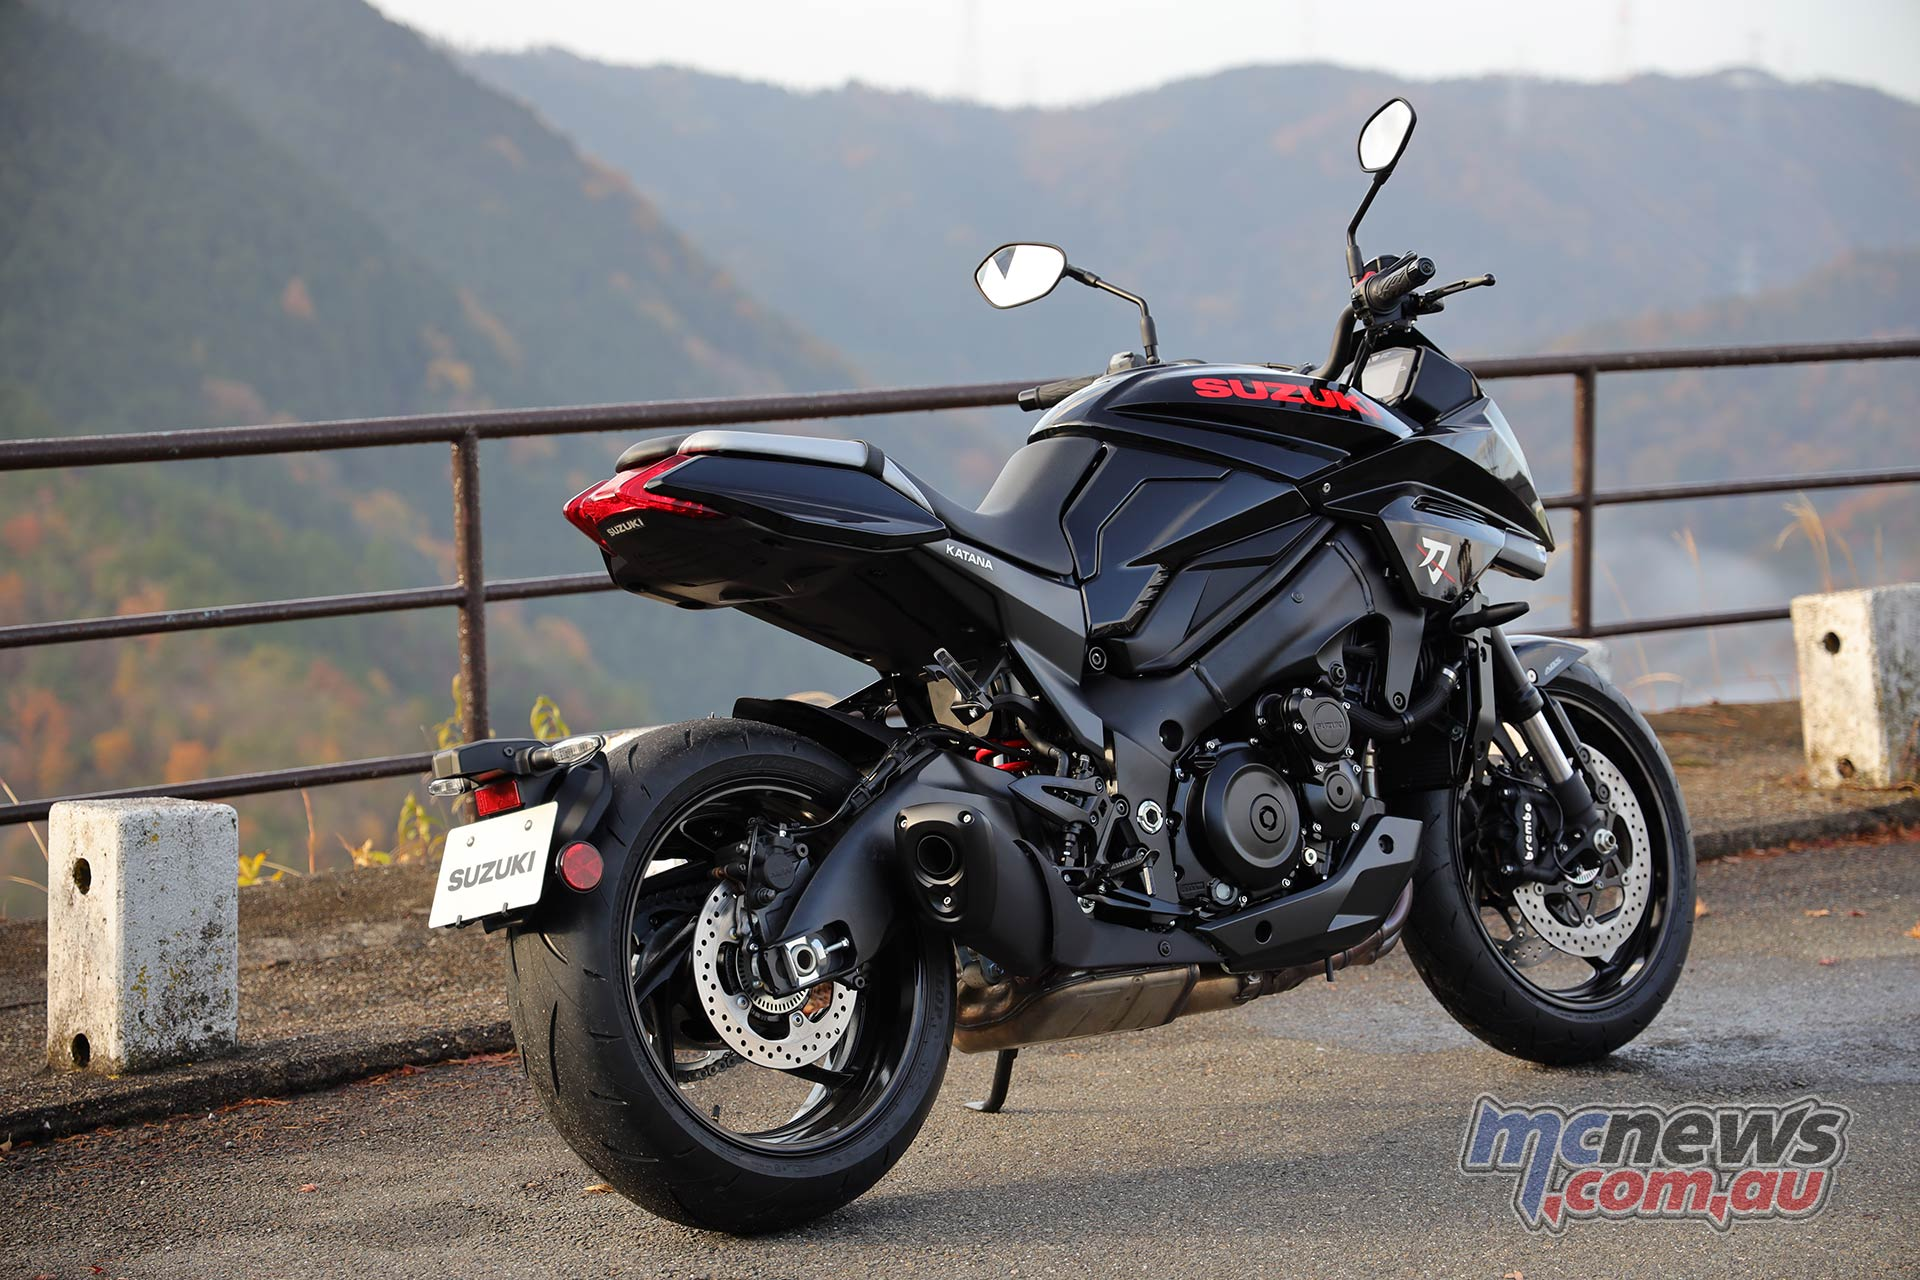 Suzuki Katana Black RHR